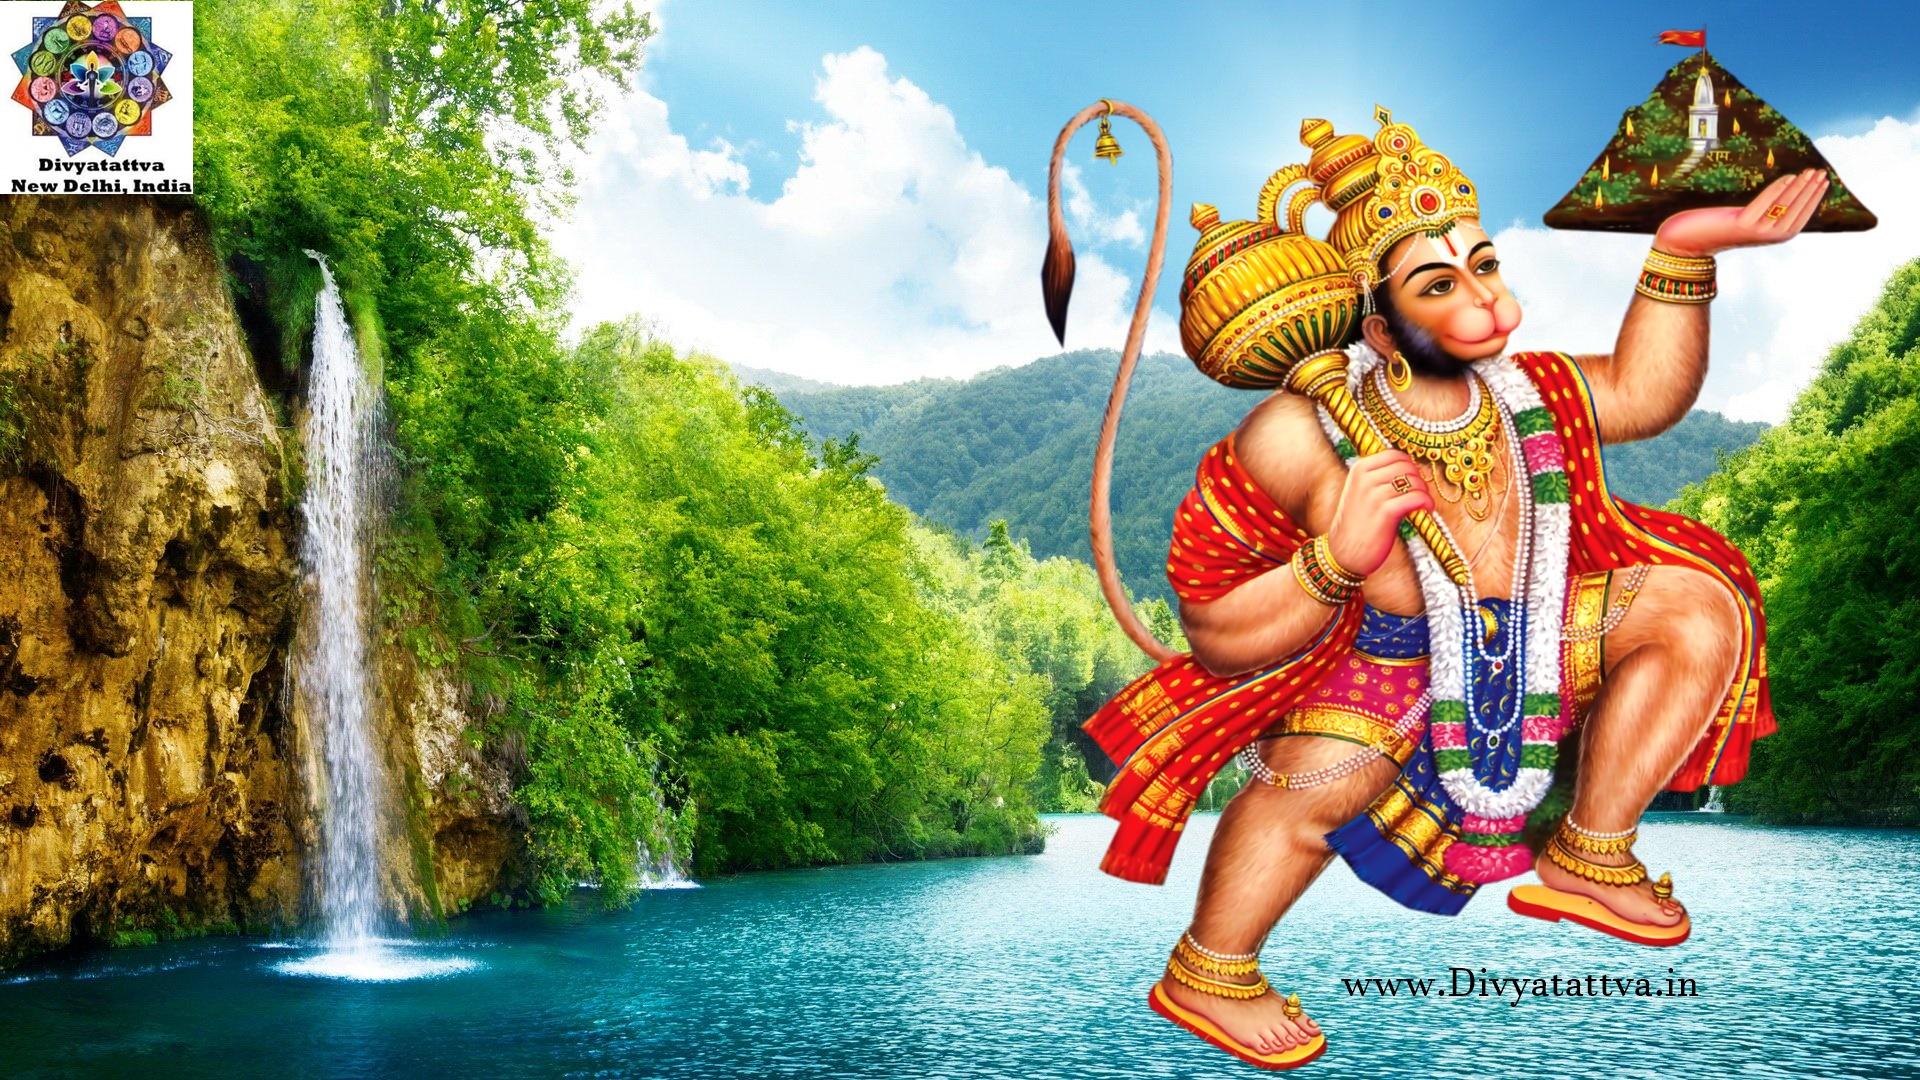 lord hanuman images for mobile wallpaper, lord hanuman full hd wallpaper download,lord hanuman digital wallpaper